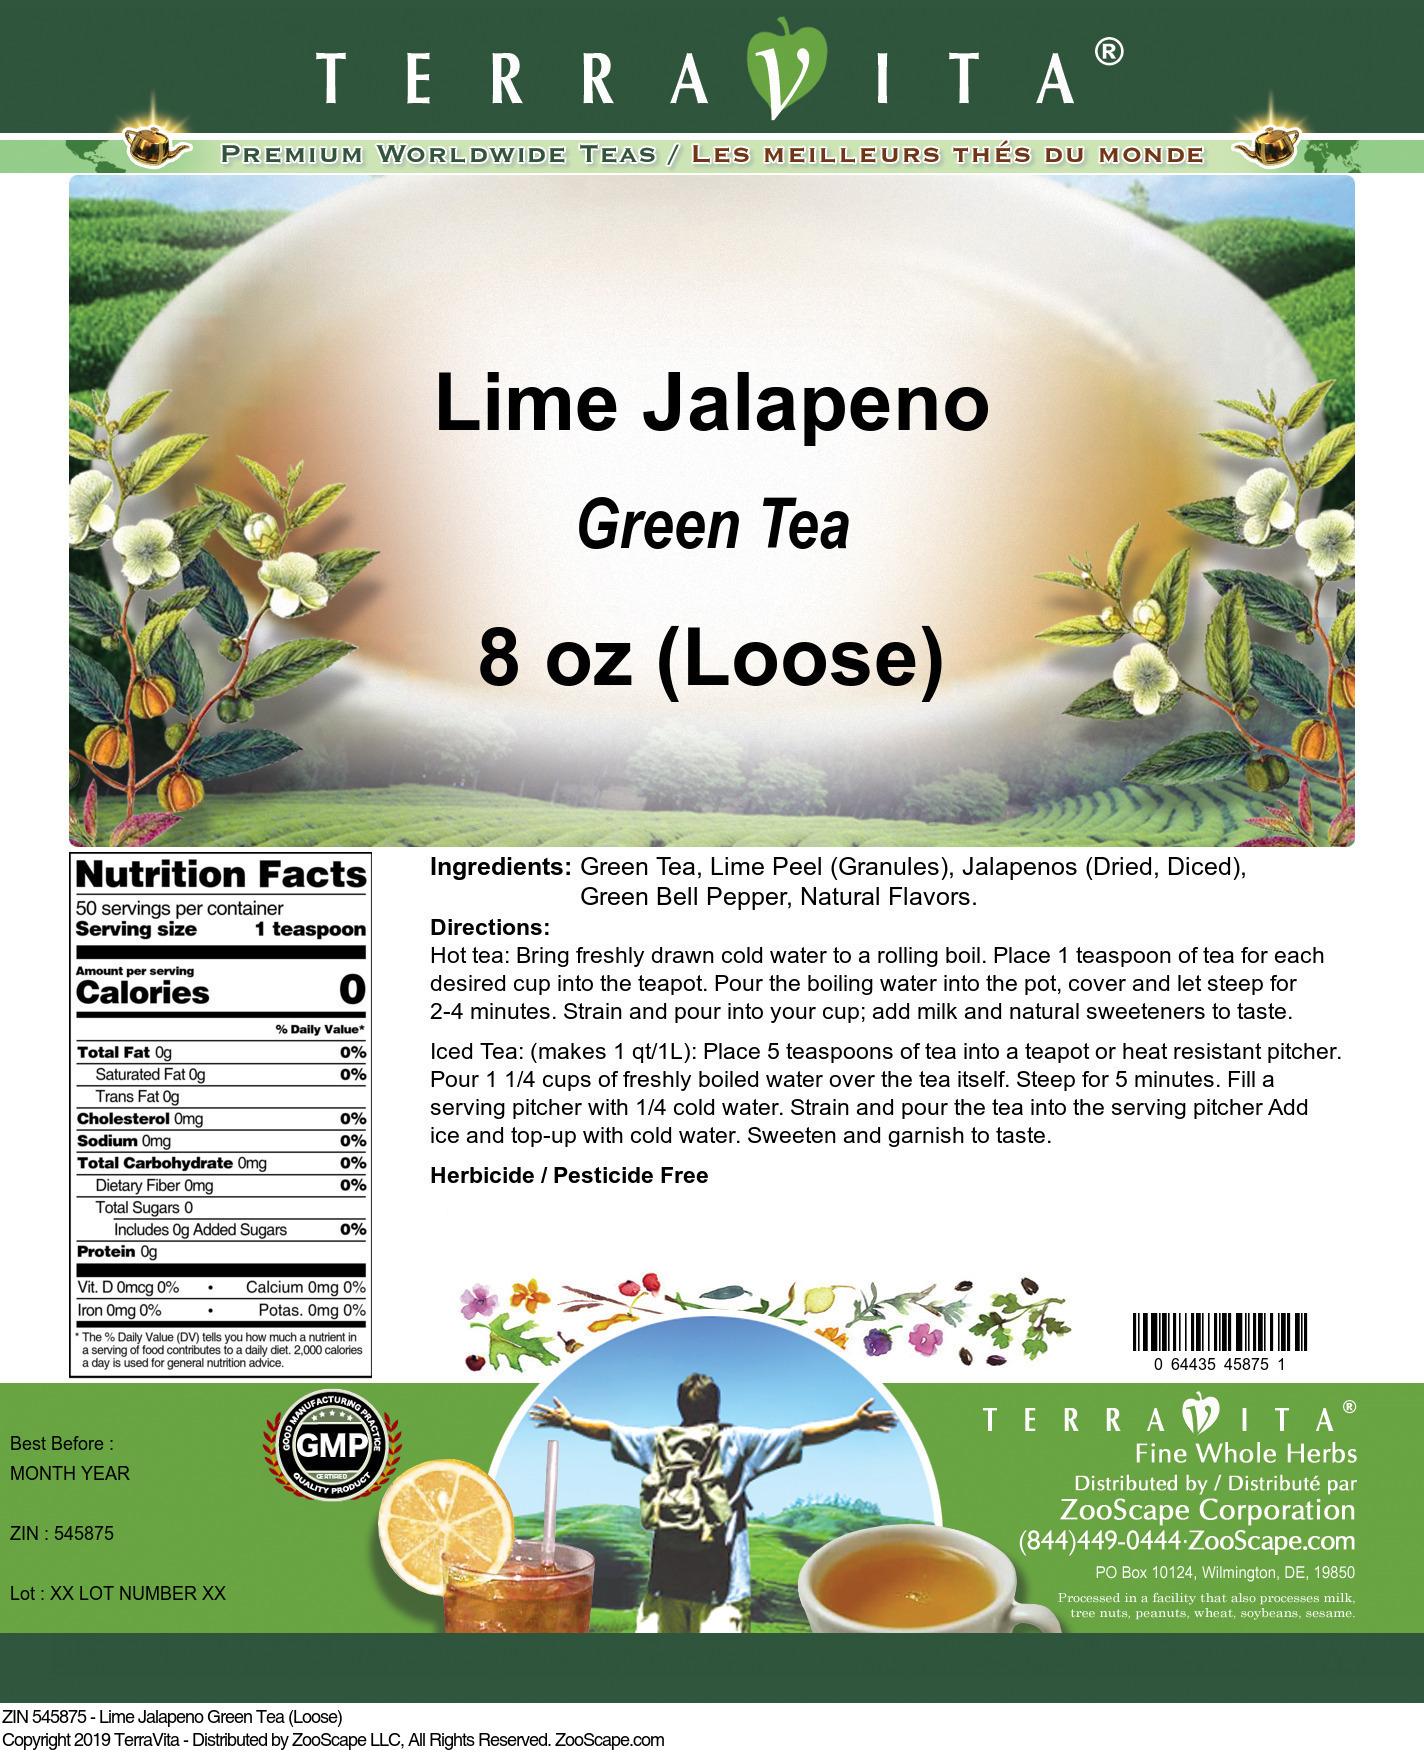 Lime Jalapeno Green Tea (Loose)